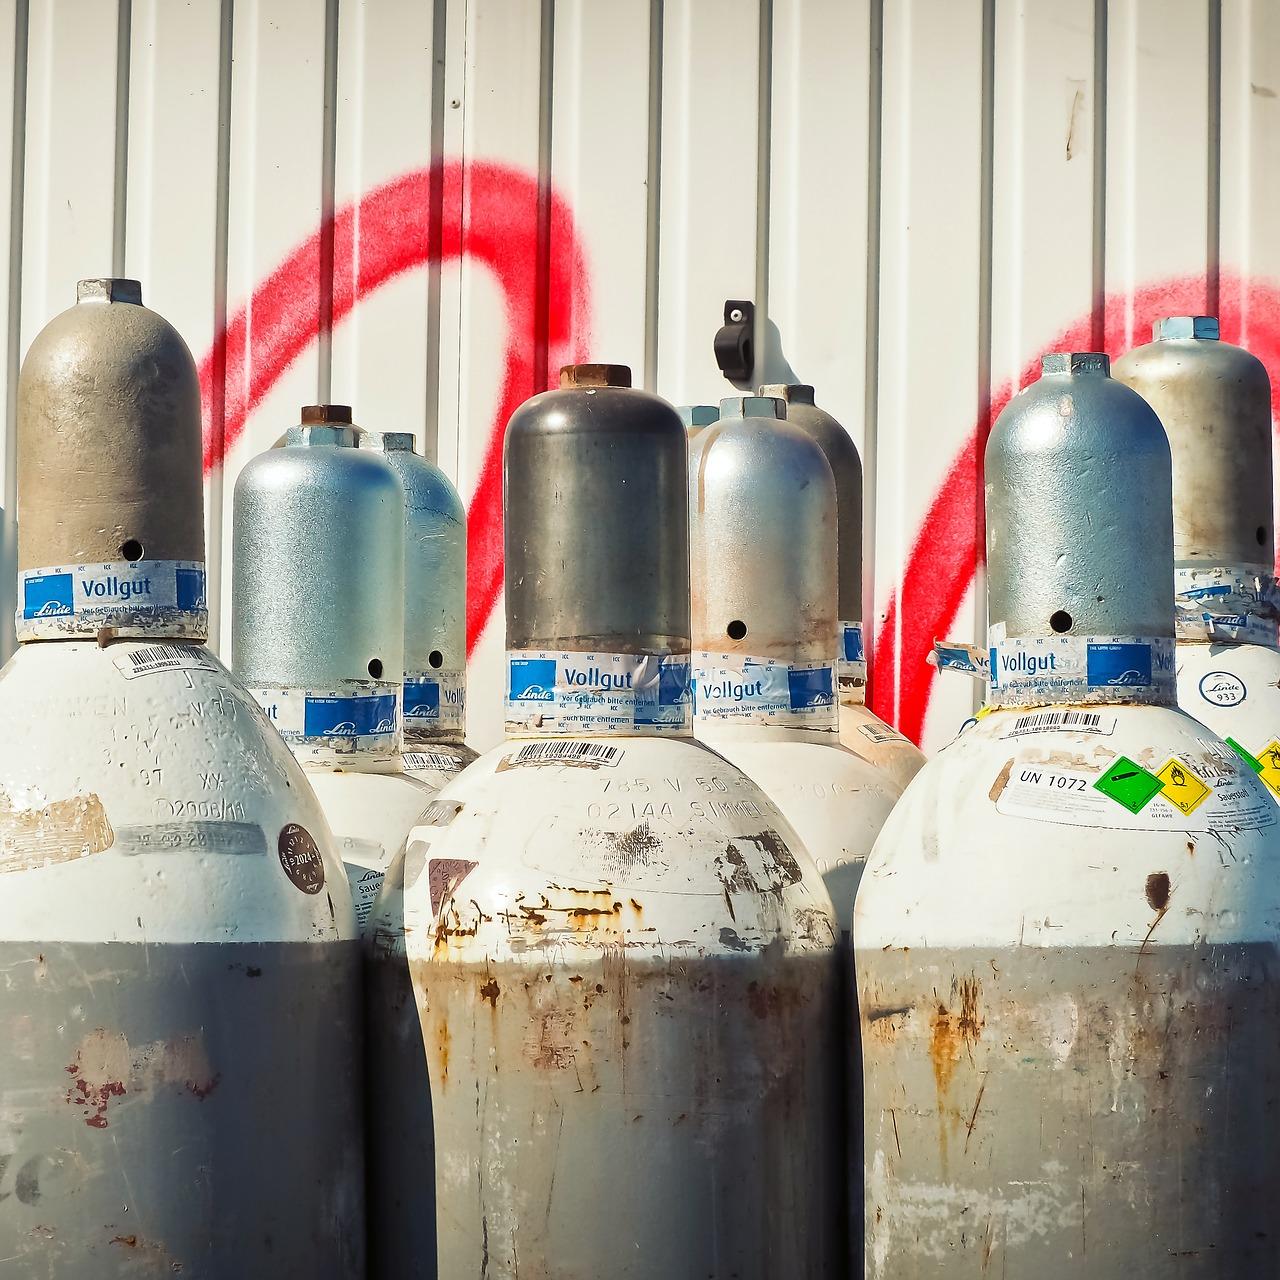 Pixabay/Michael Gaida: Nosný plyn v plynové chromatografii - helium a vodík